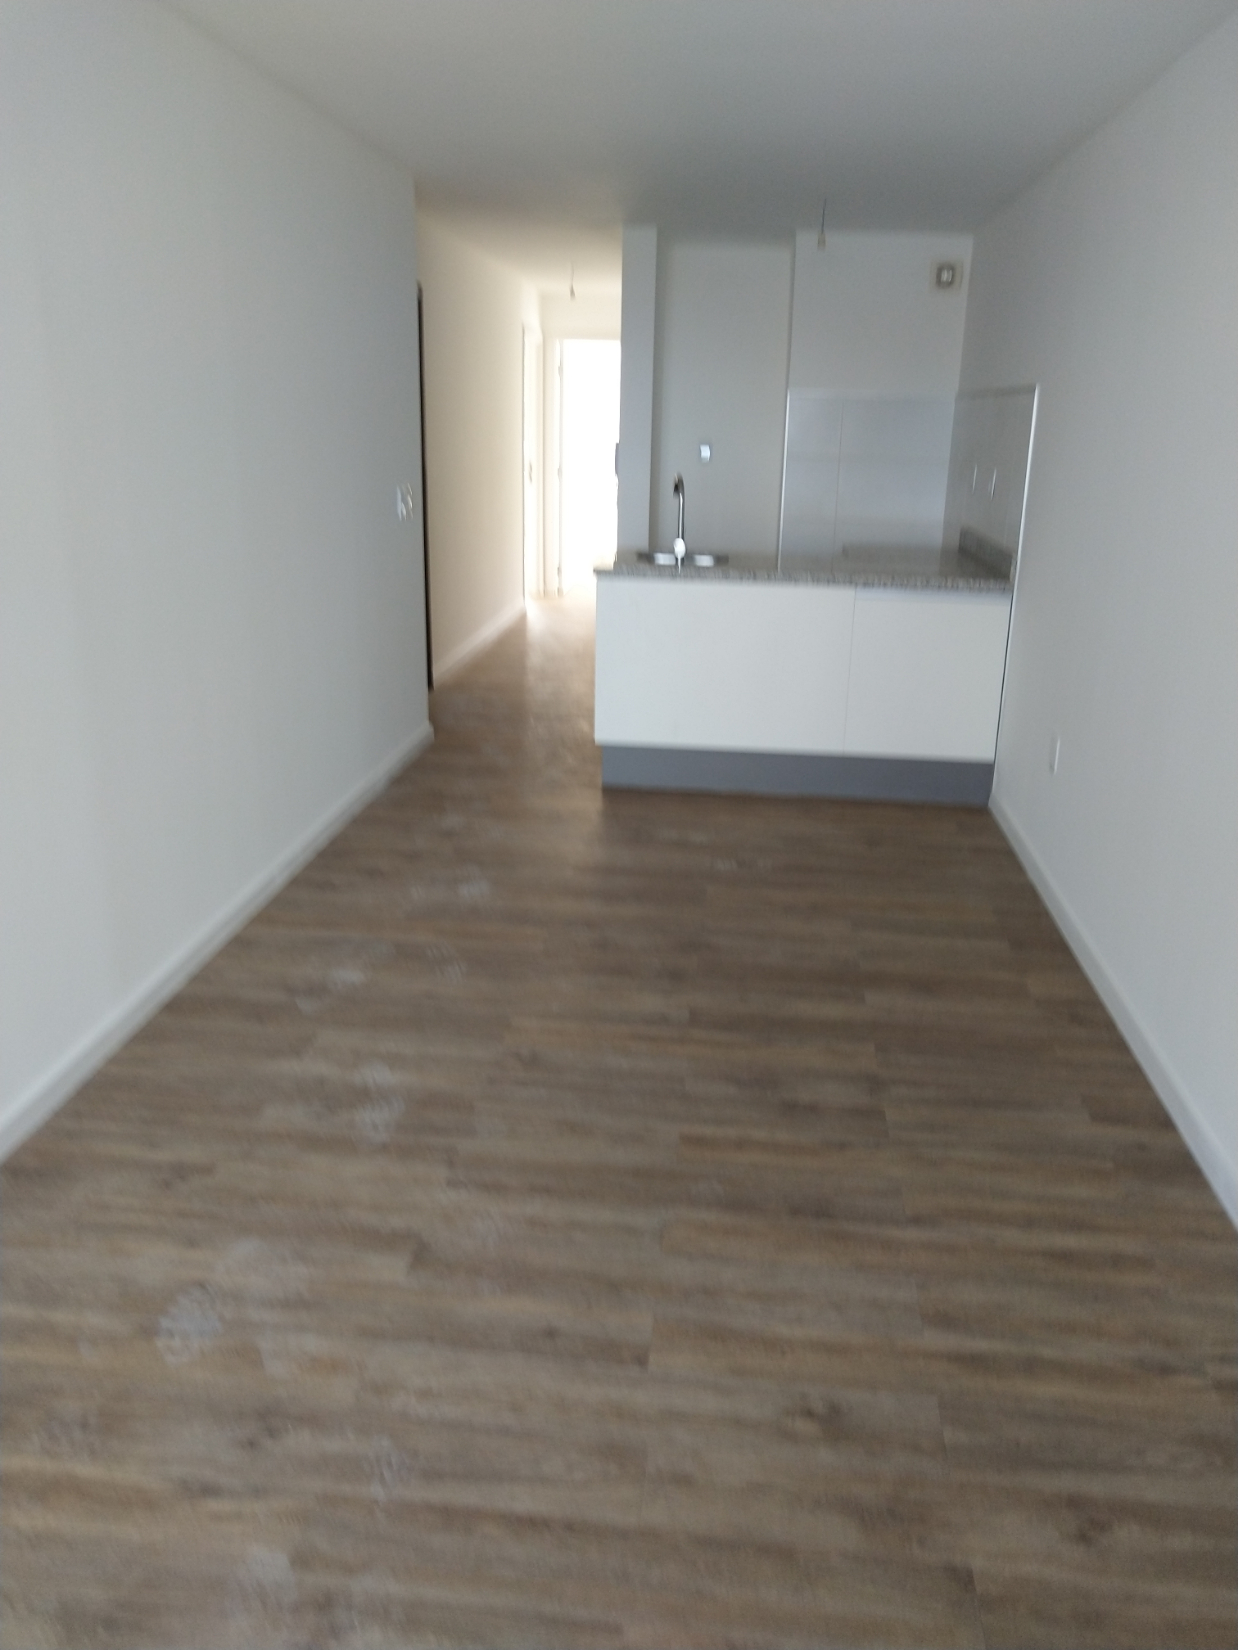 Venta - 1 Dormitorio - Nuevo - Lift Cordon